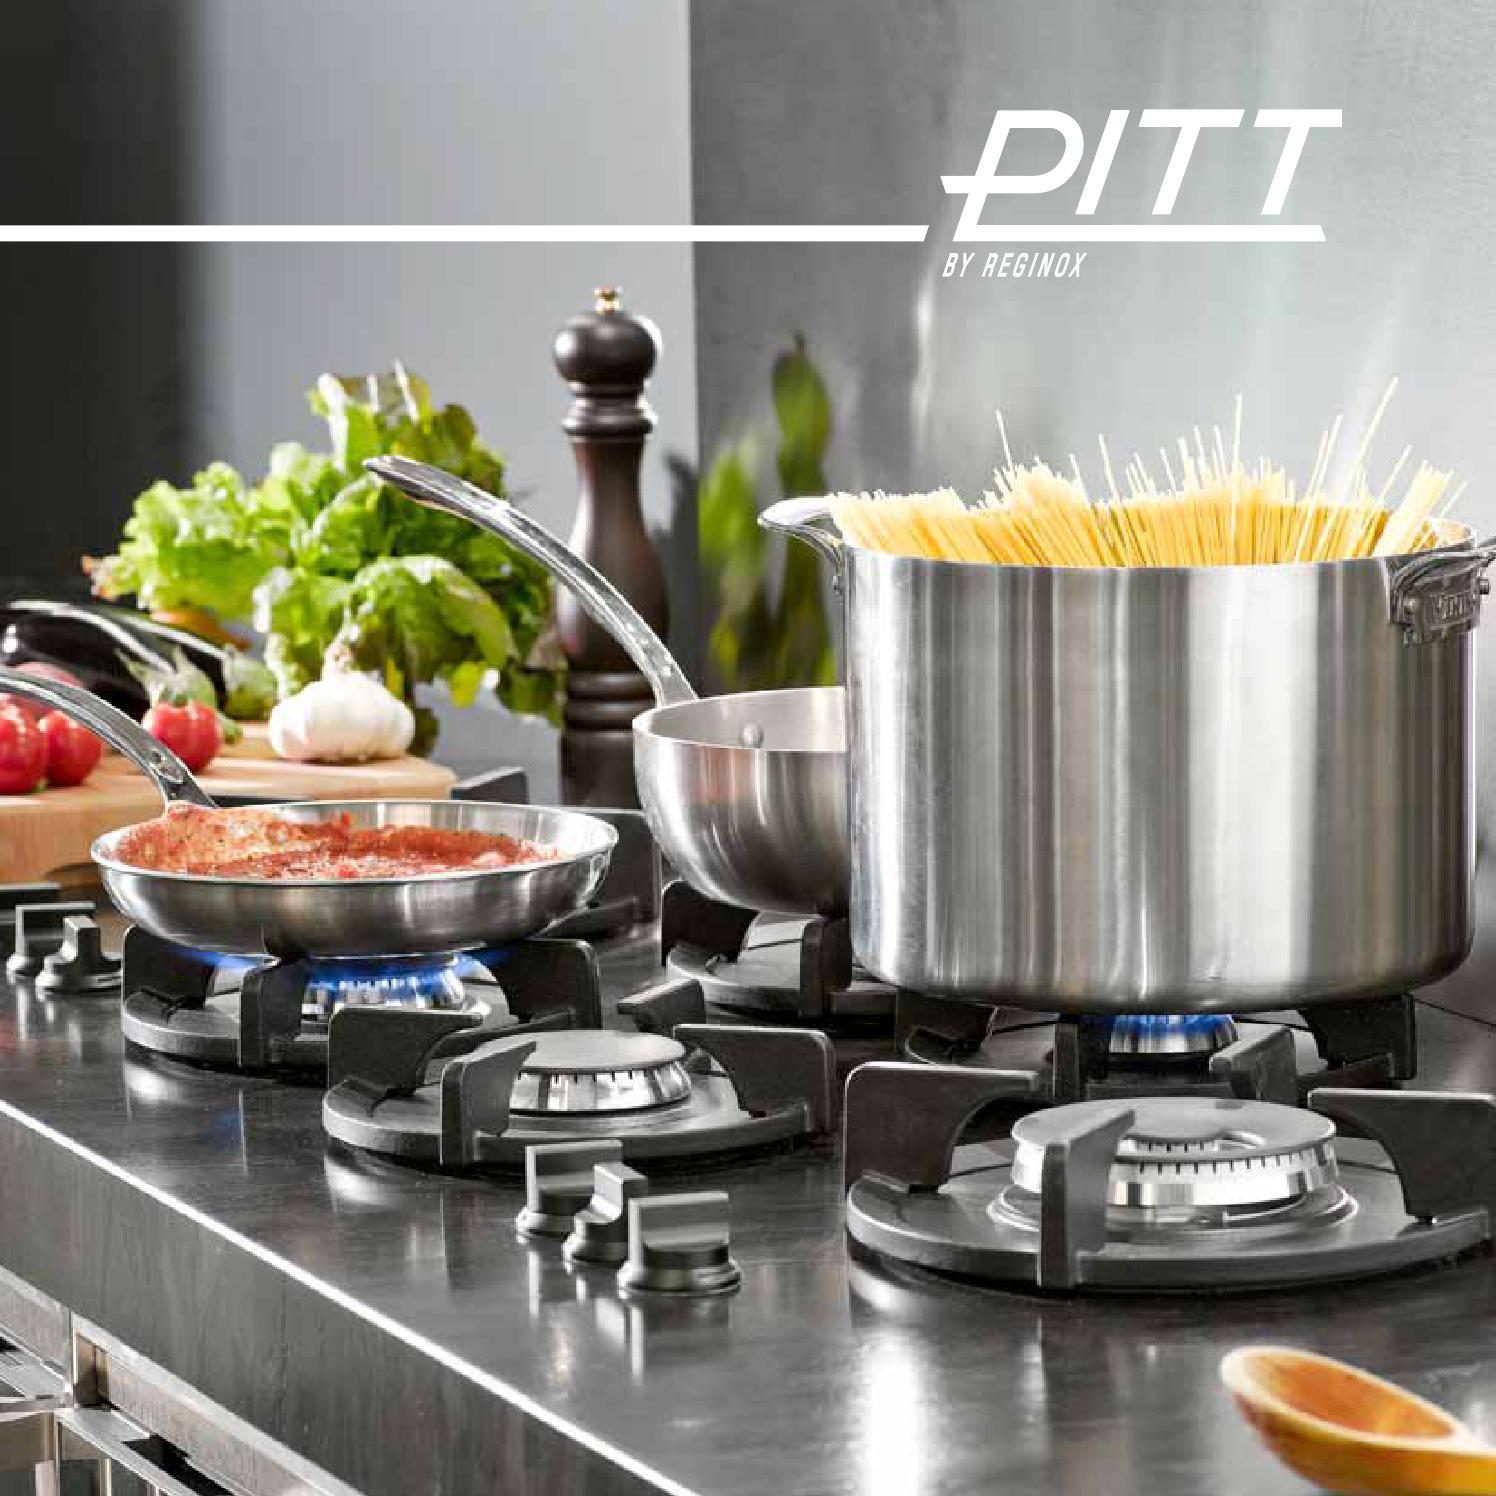 Brochure PITT by Reginox | Version: Germany by PITT cooking - issuu